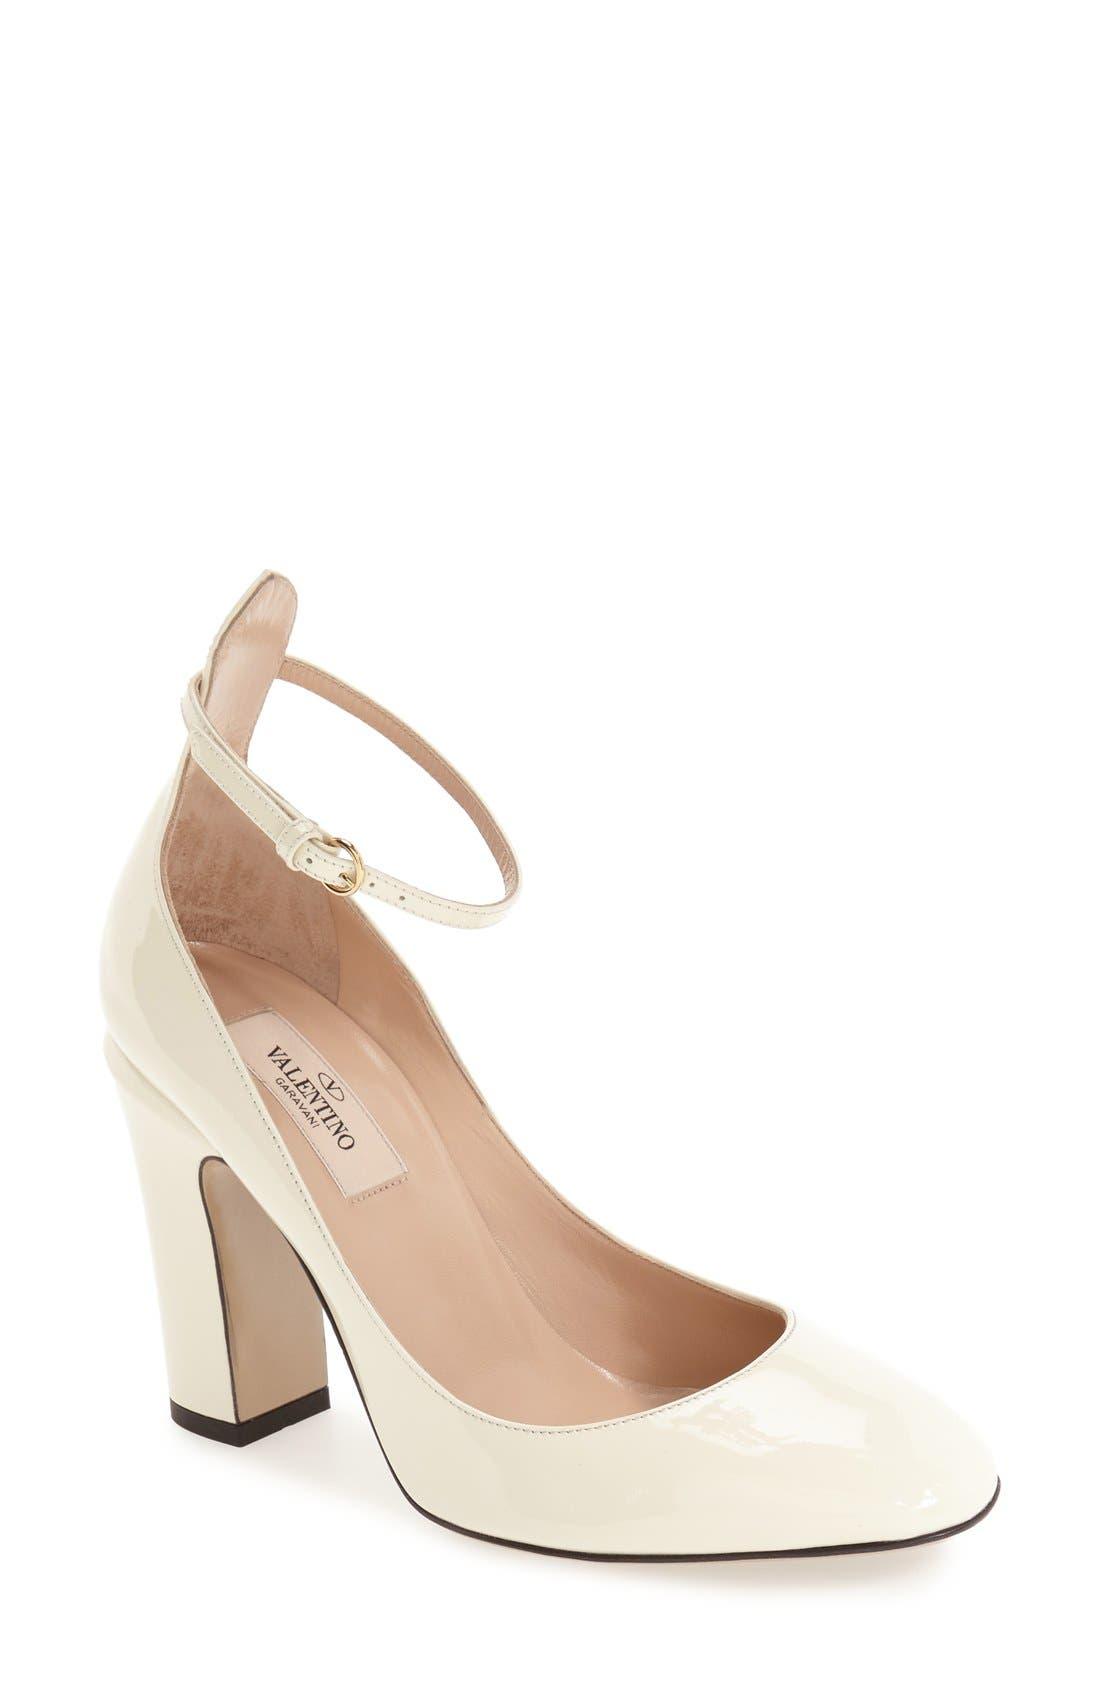 Alternate Image 1 Selected - Valentino 'Tango' Ankle Strap Pump (Women)